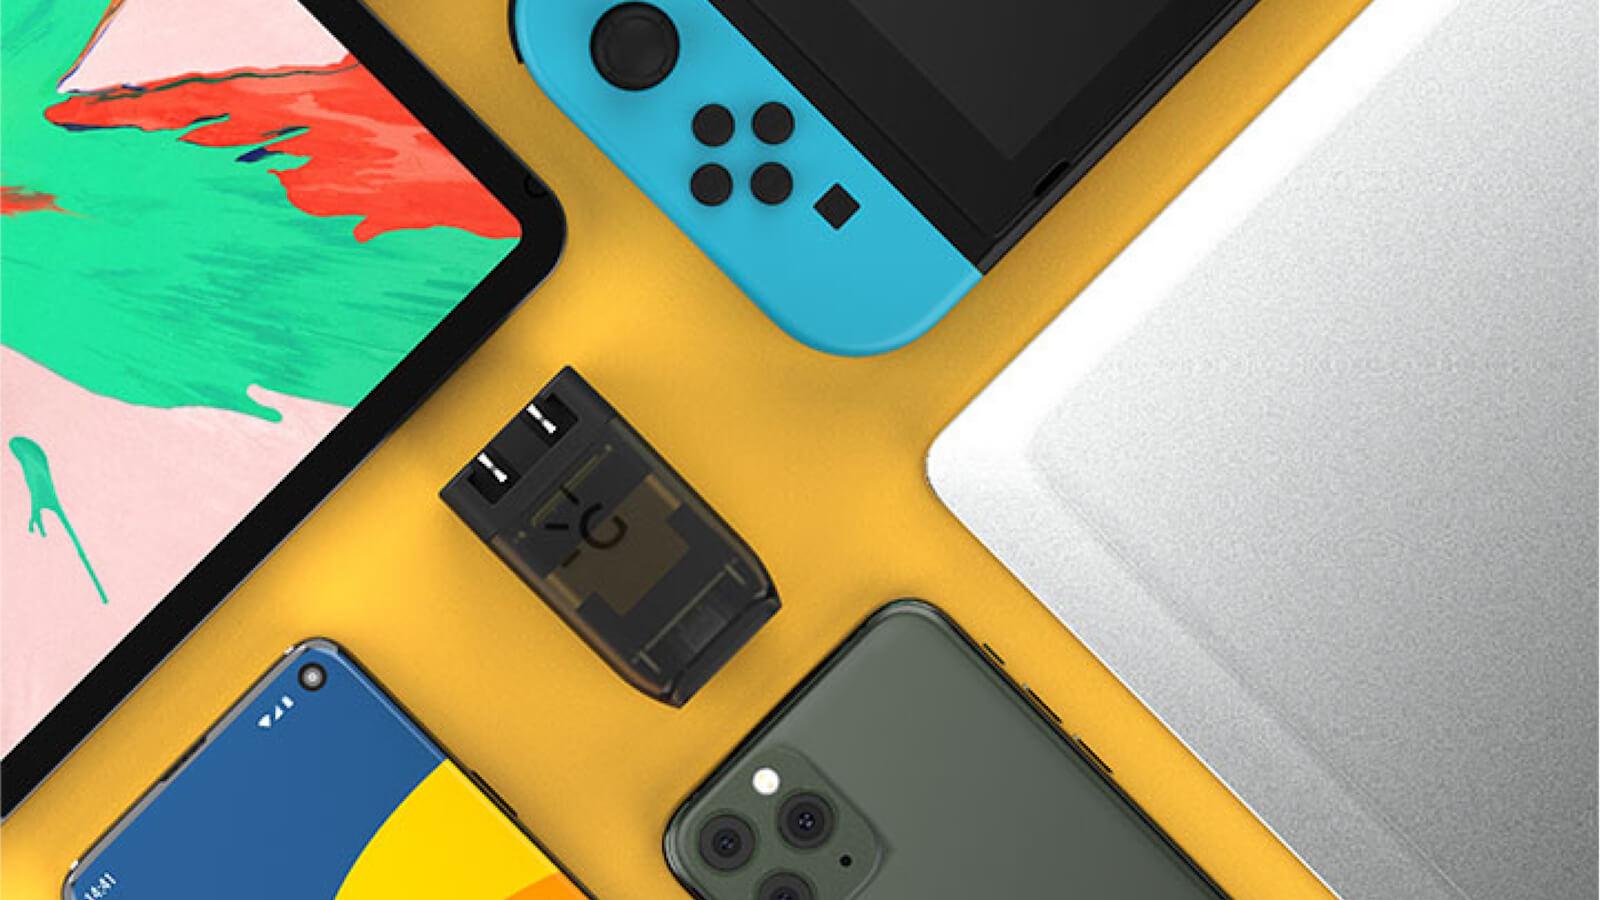 Genki Covert Dock Nintendo Switch converter brings games to the TV